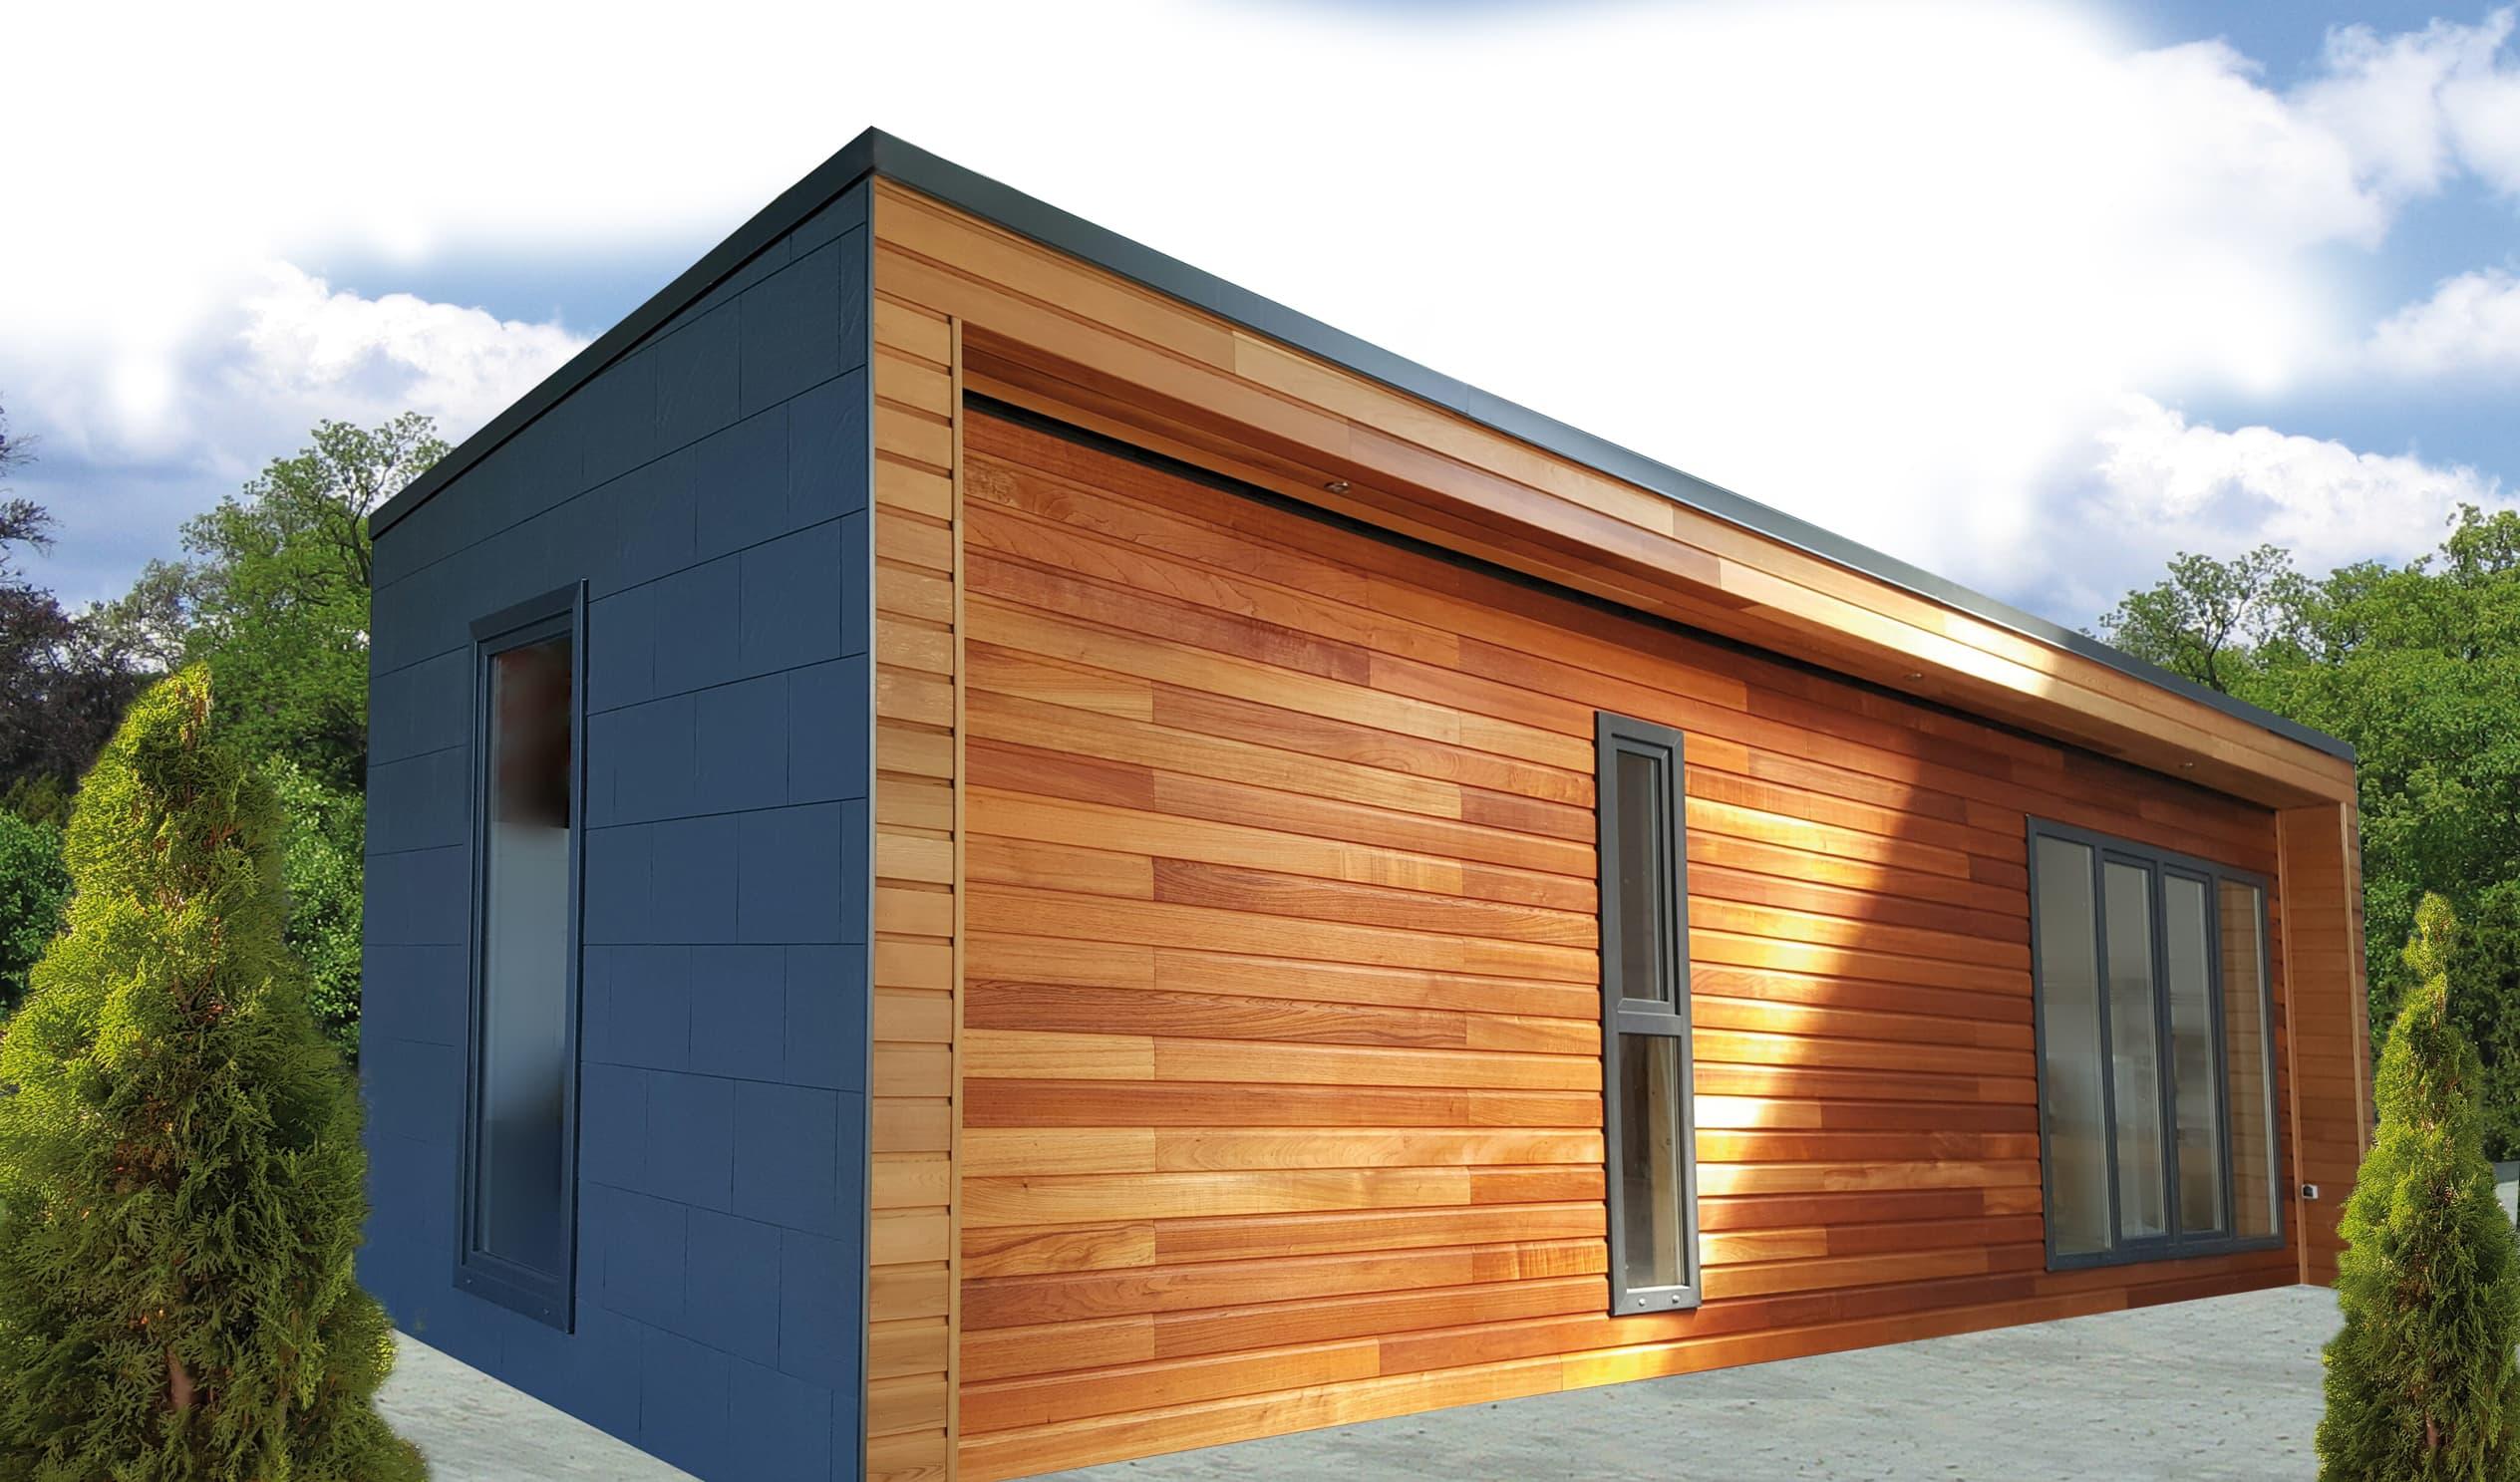 kingston luxus hgb mobilheime. Black Bedroom Furniture Sets. Home Design Ideas